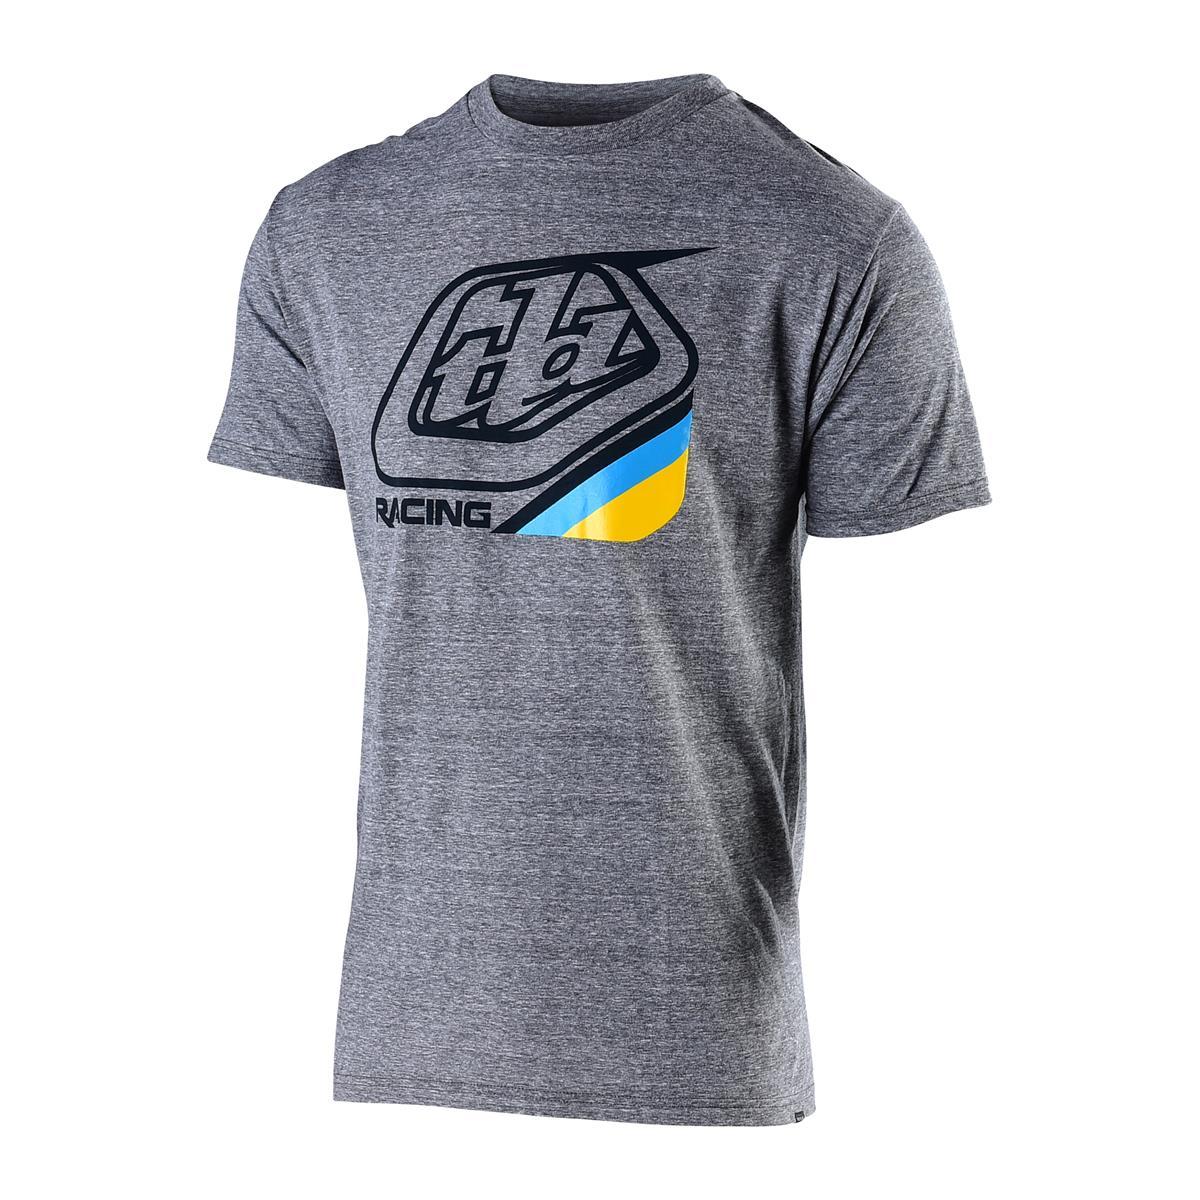 Troy Lee Designs T-Shirt Precision 2.0 Vintage Grey Snow